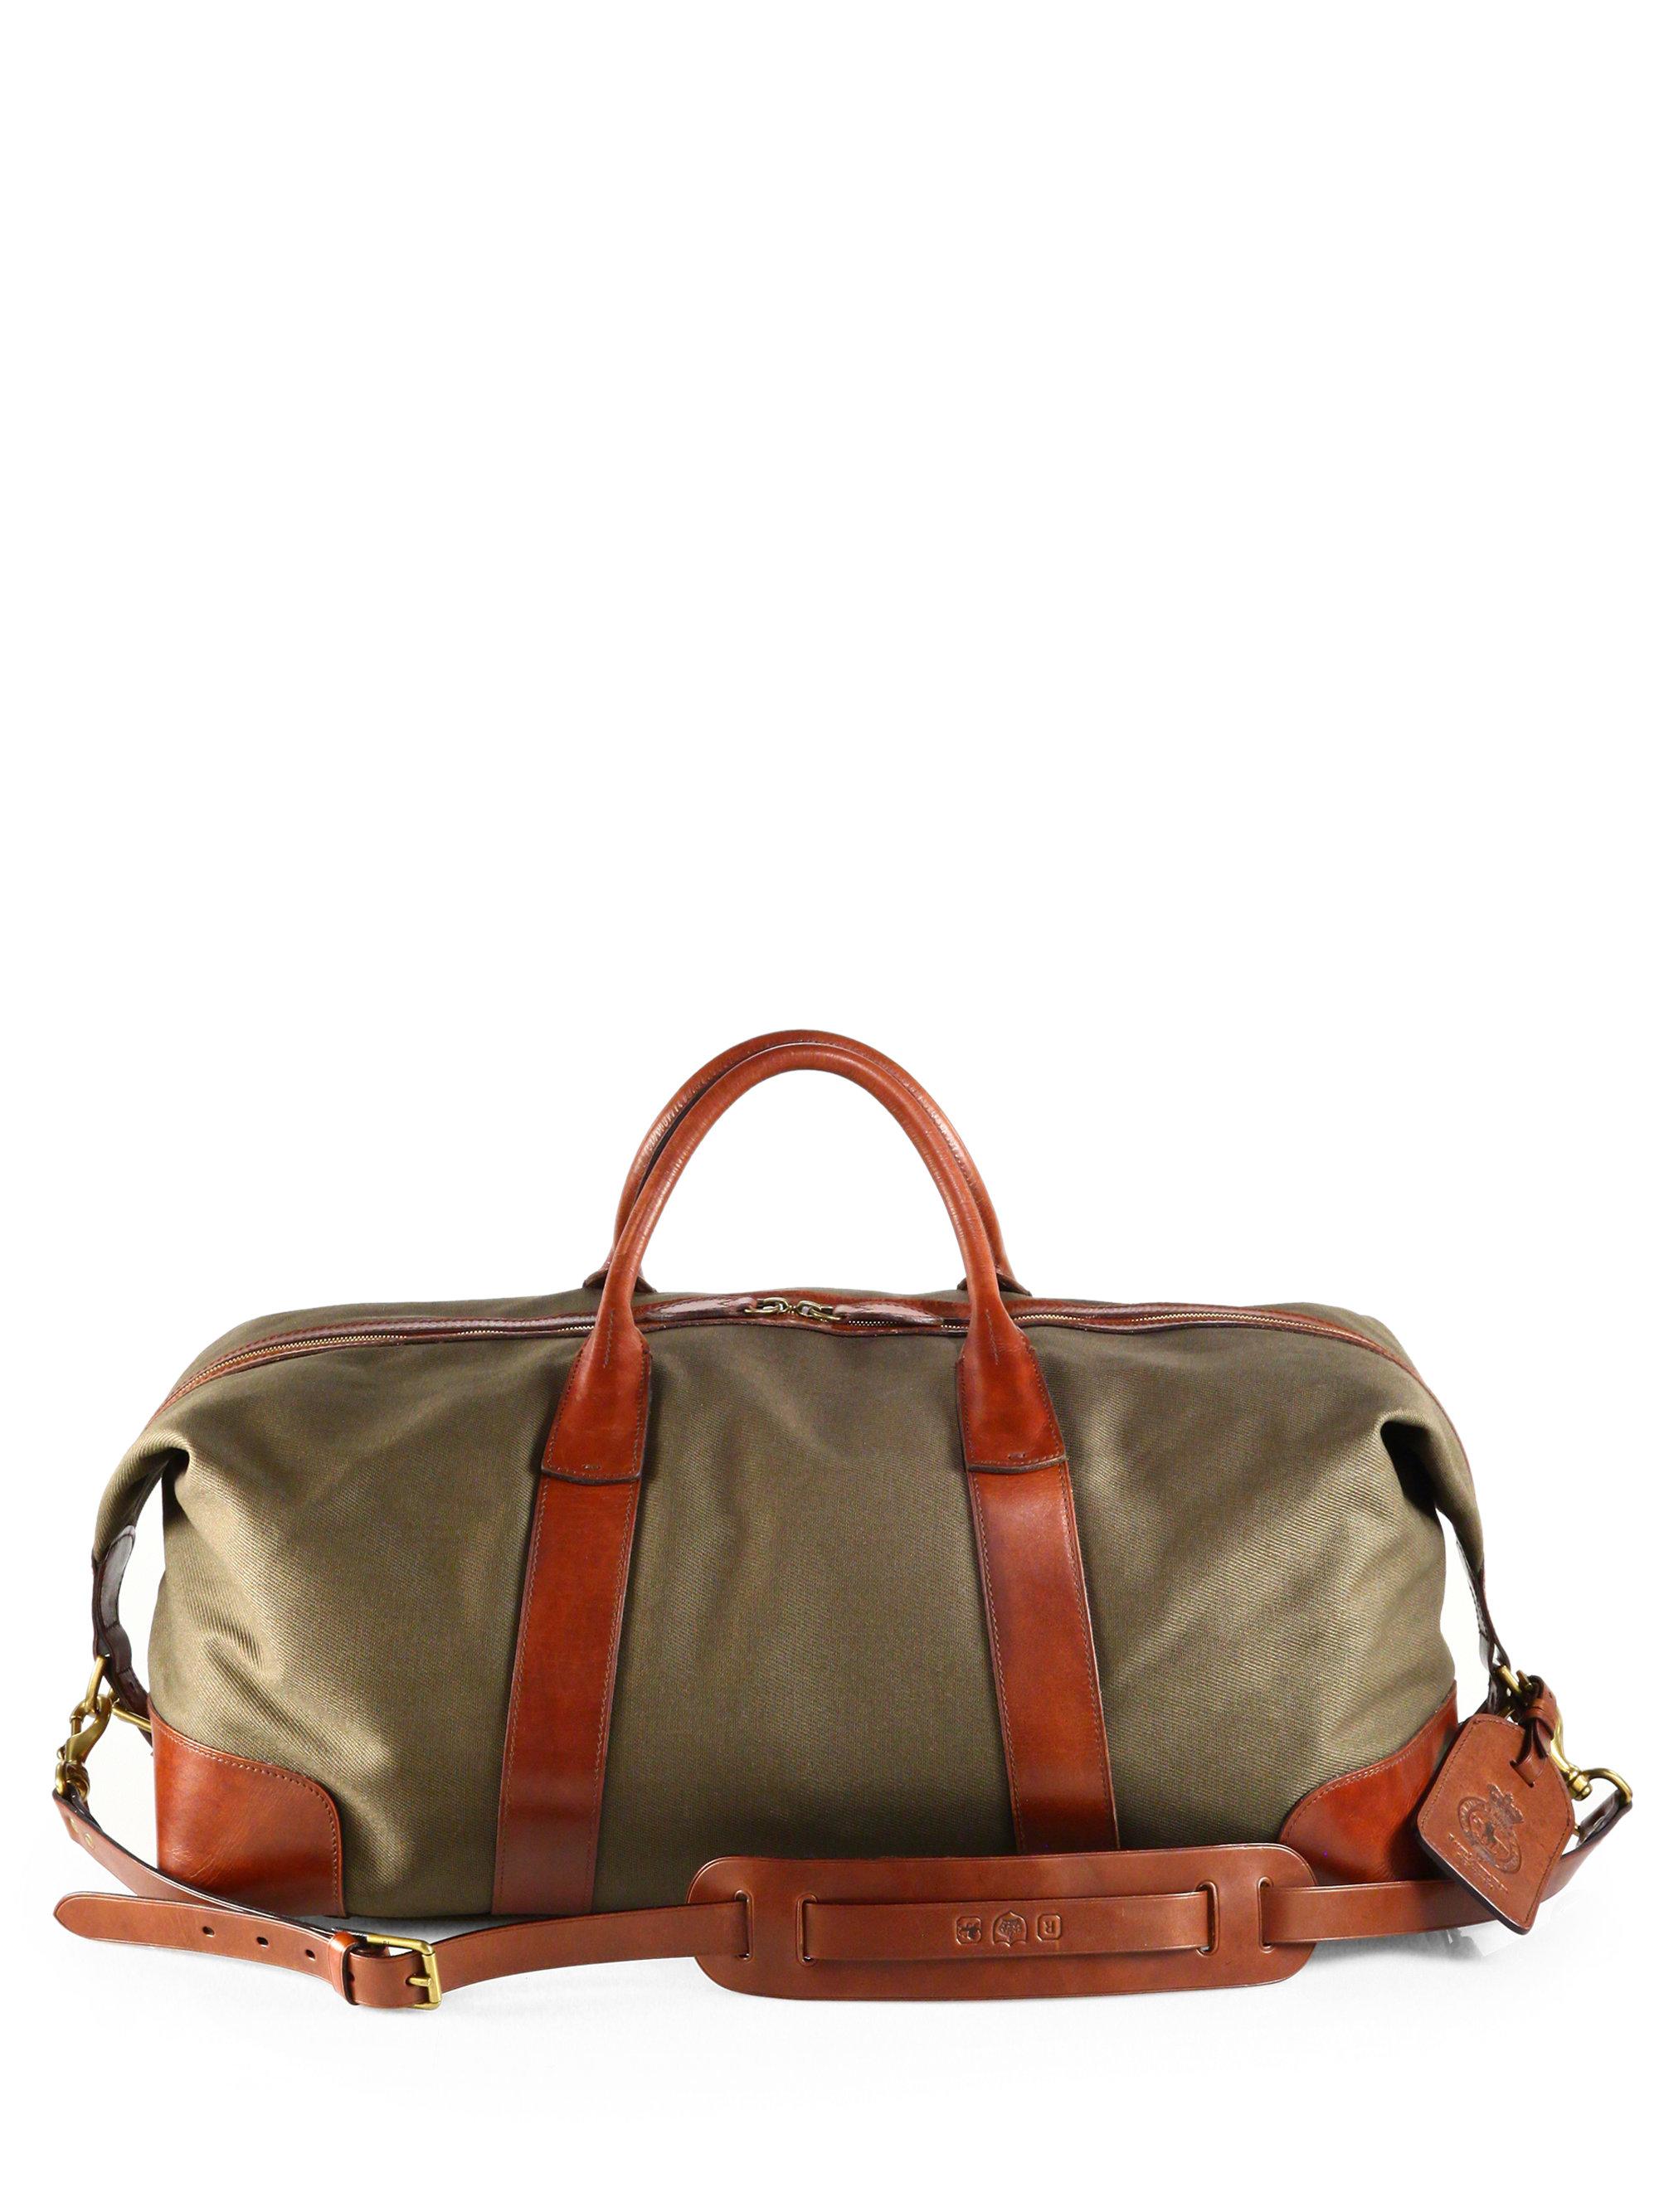 ... uk lyst polo ralph lauren waxed twill duffle bag in green for men 4ab0e  1699c 82e8794a1c